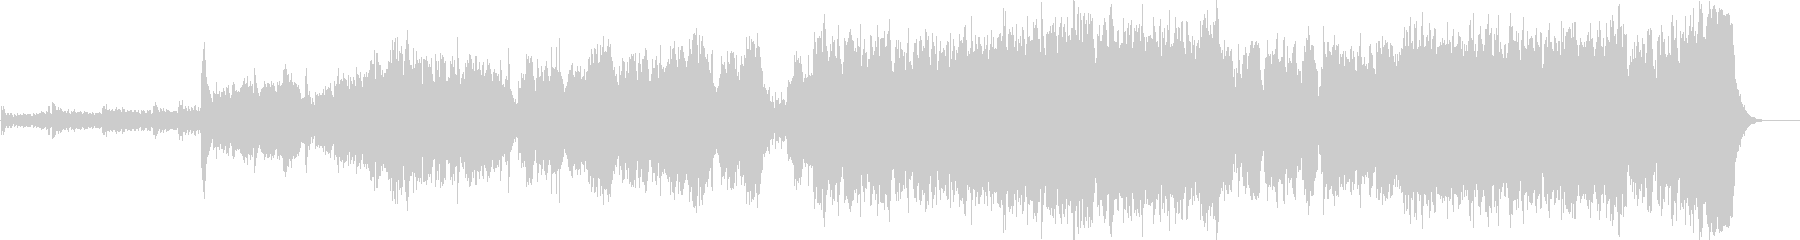 BGMの未再生の波形